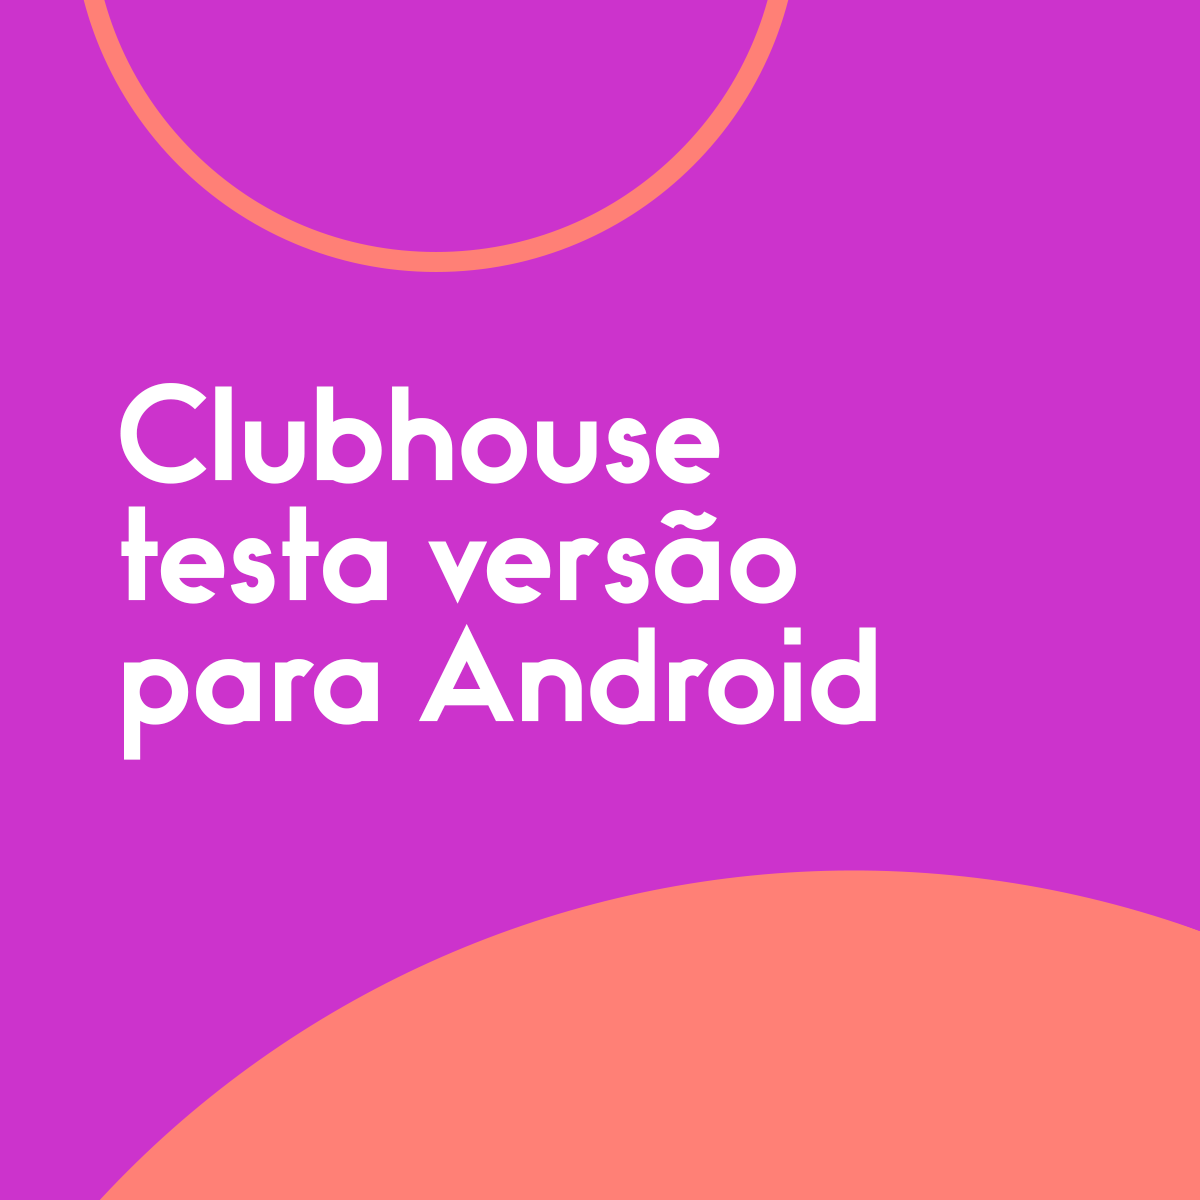 Clubhouse-testa-versão-para-Android